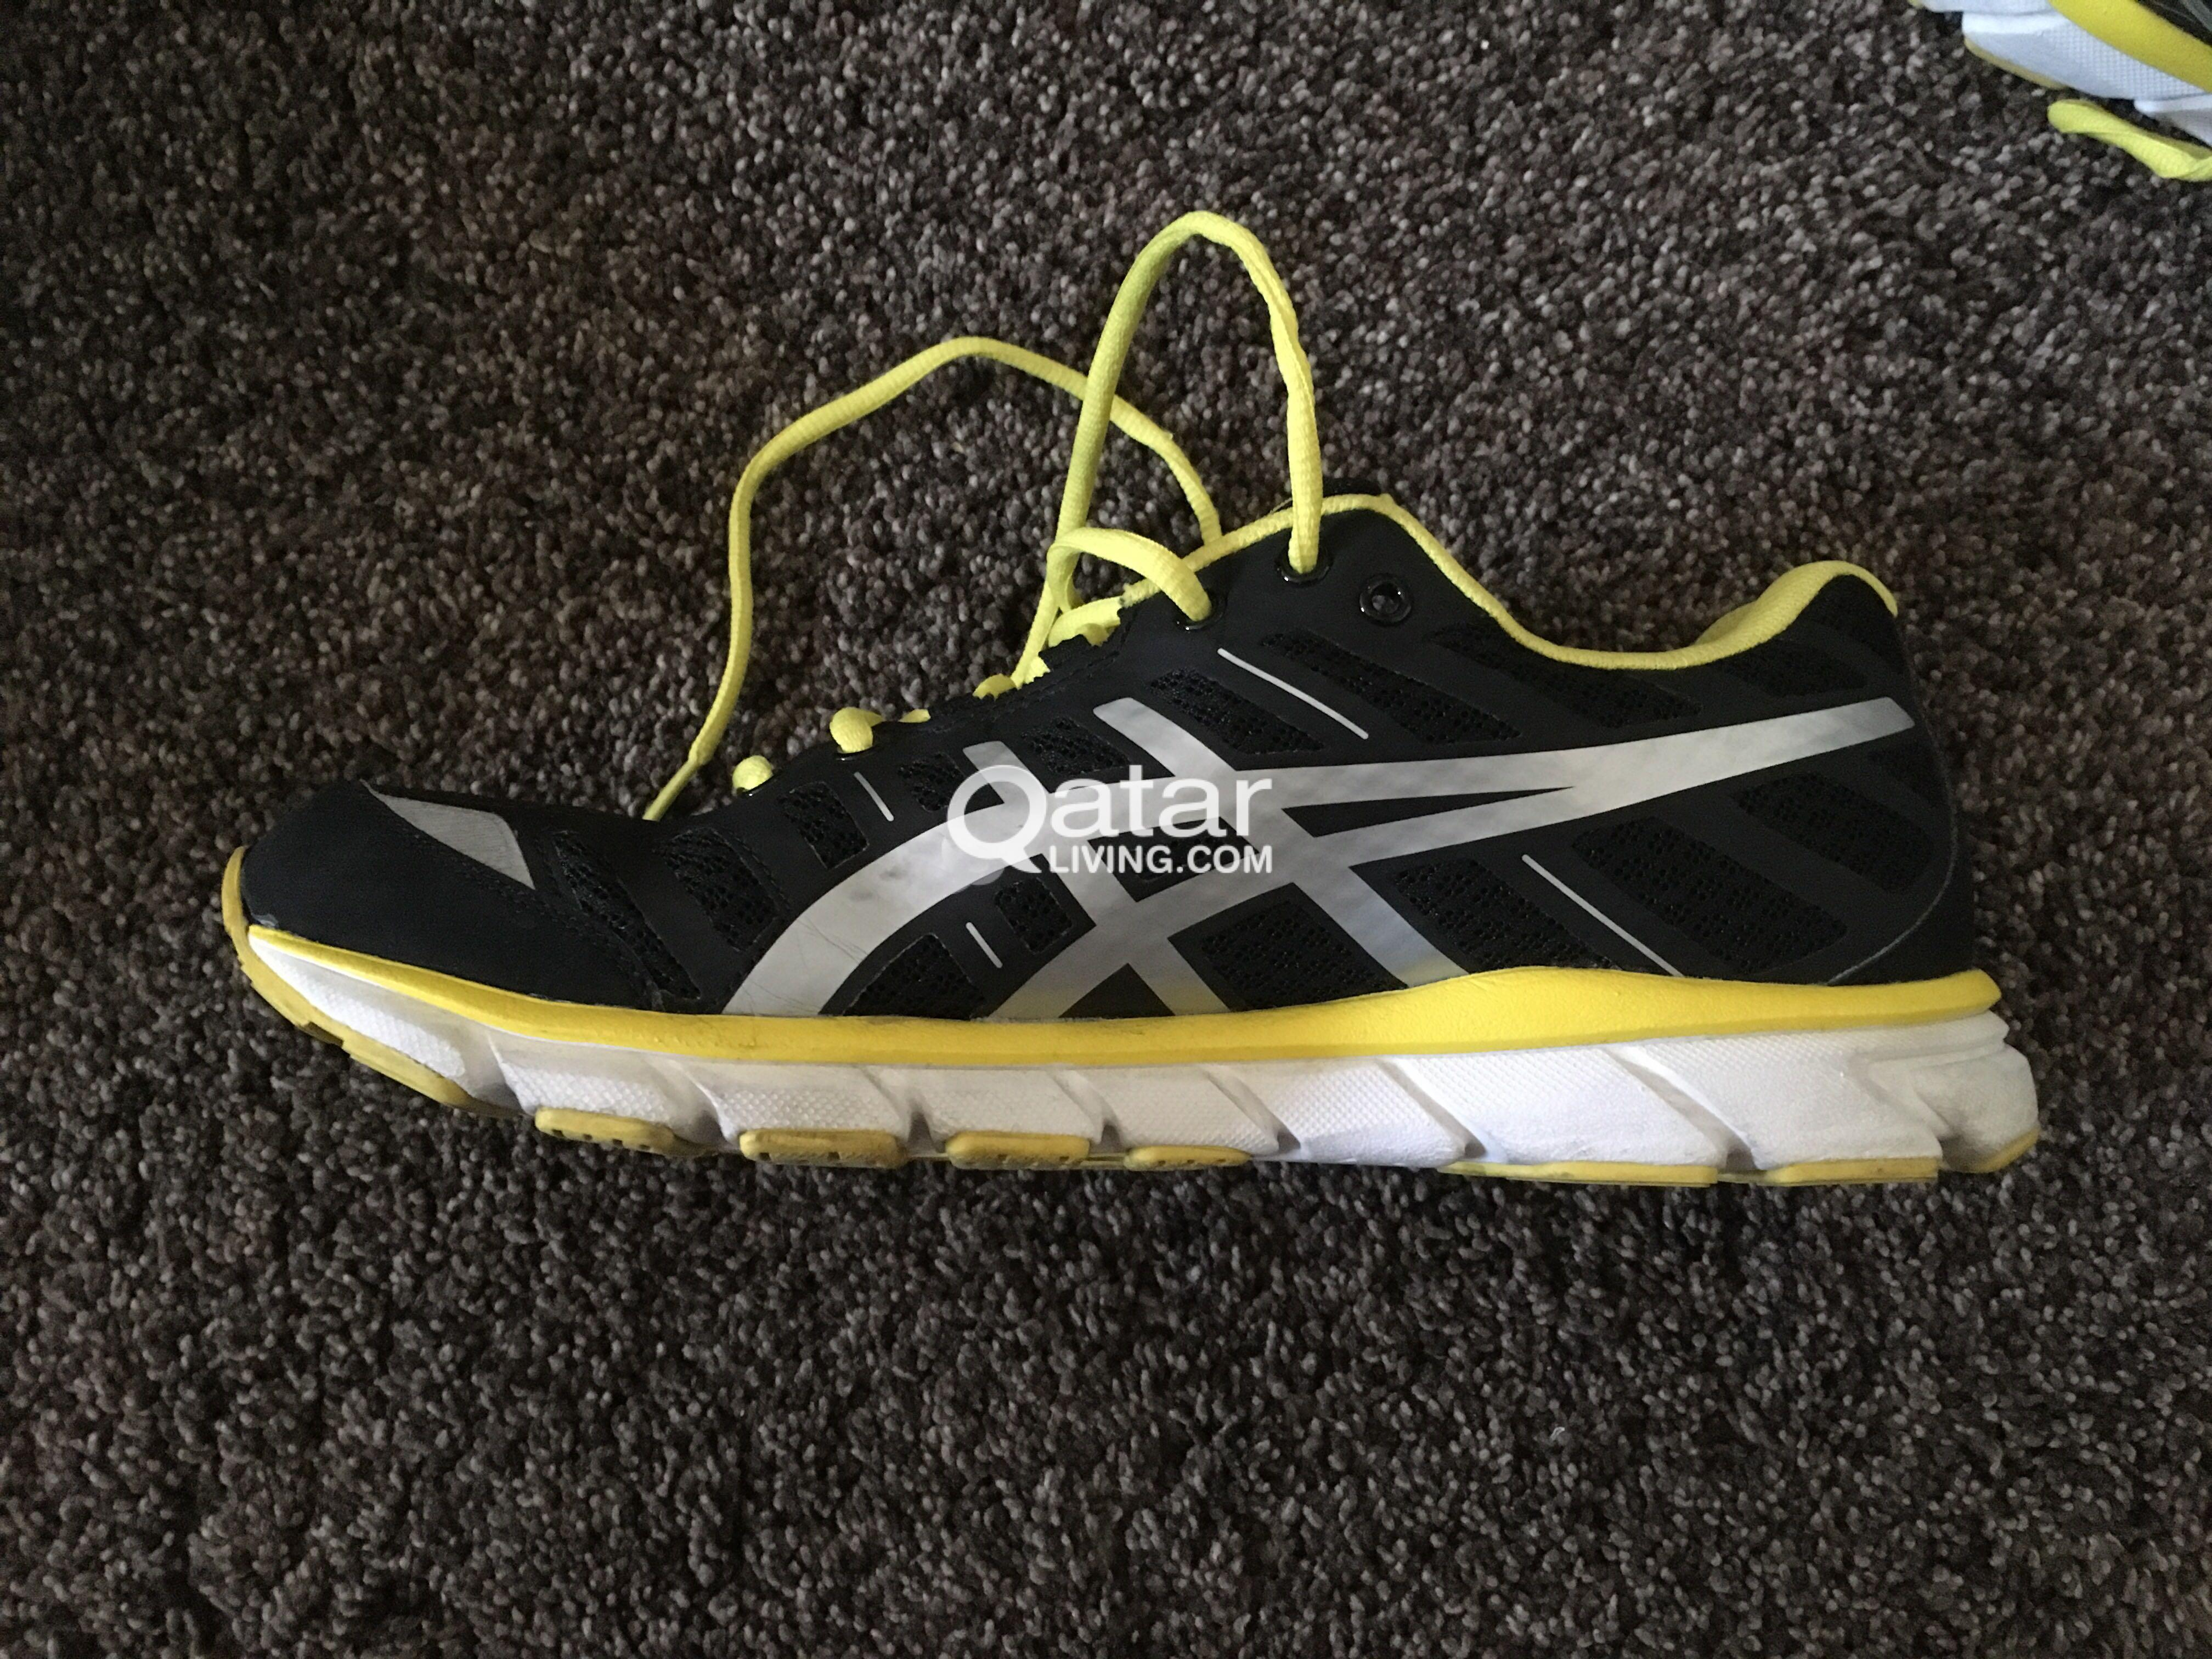 Asics Gel running shoes   Qatar Living